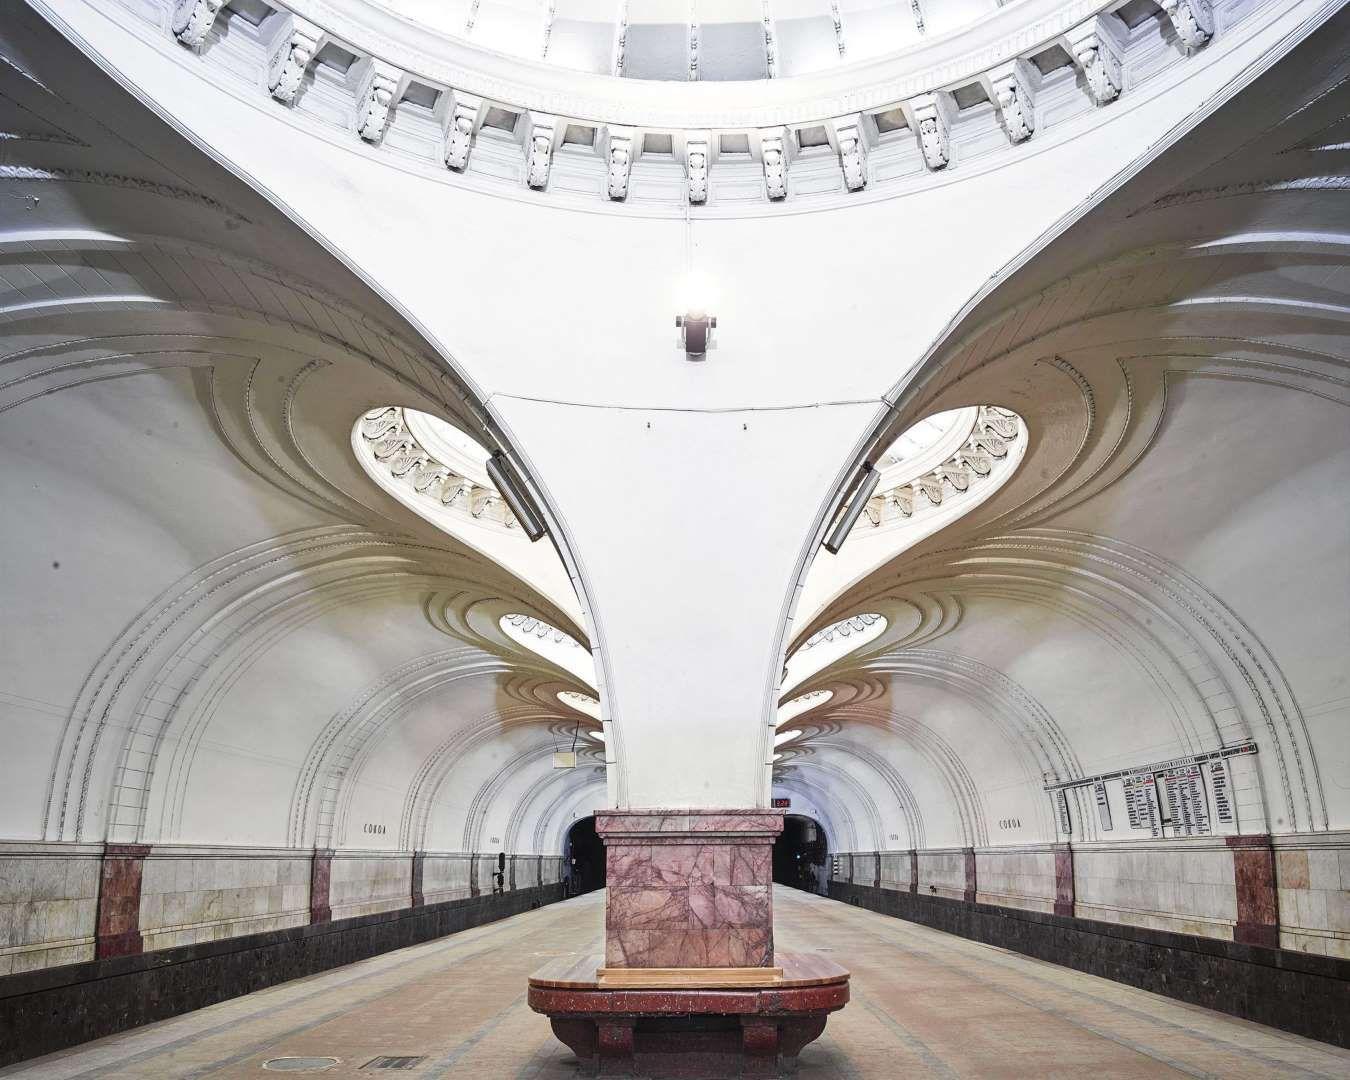 Sokol Metro Station Moscow Russia - David Burdeny/REX/Shutterstock